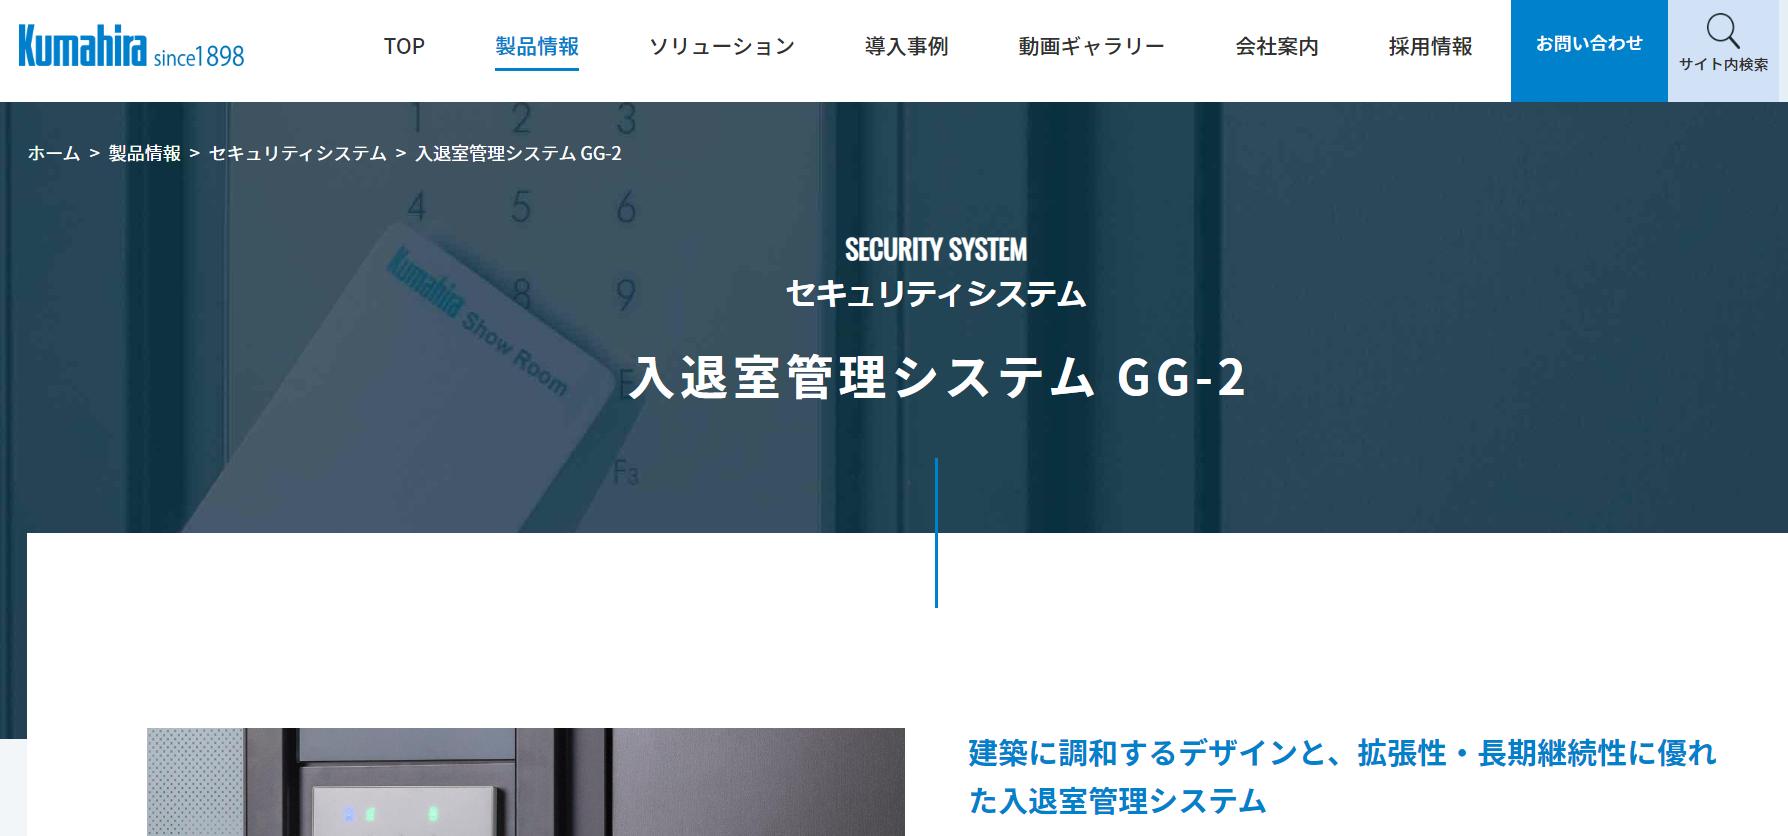 GG-2 公式Webサイト